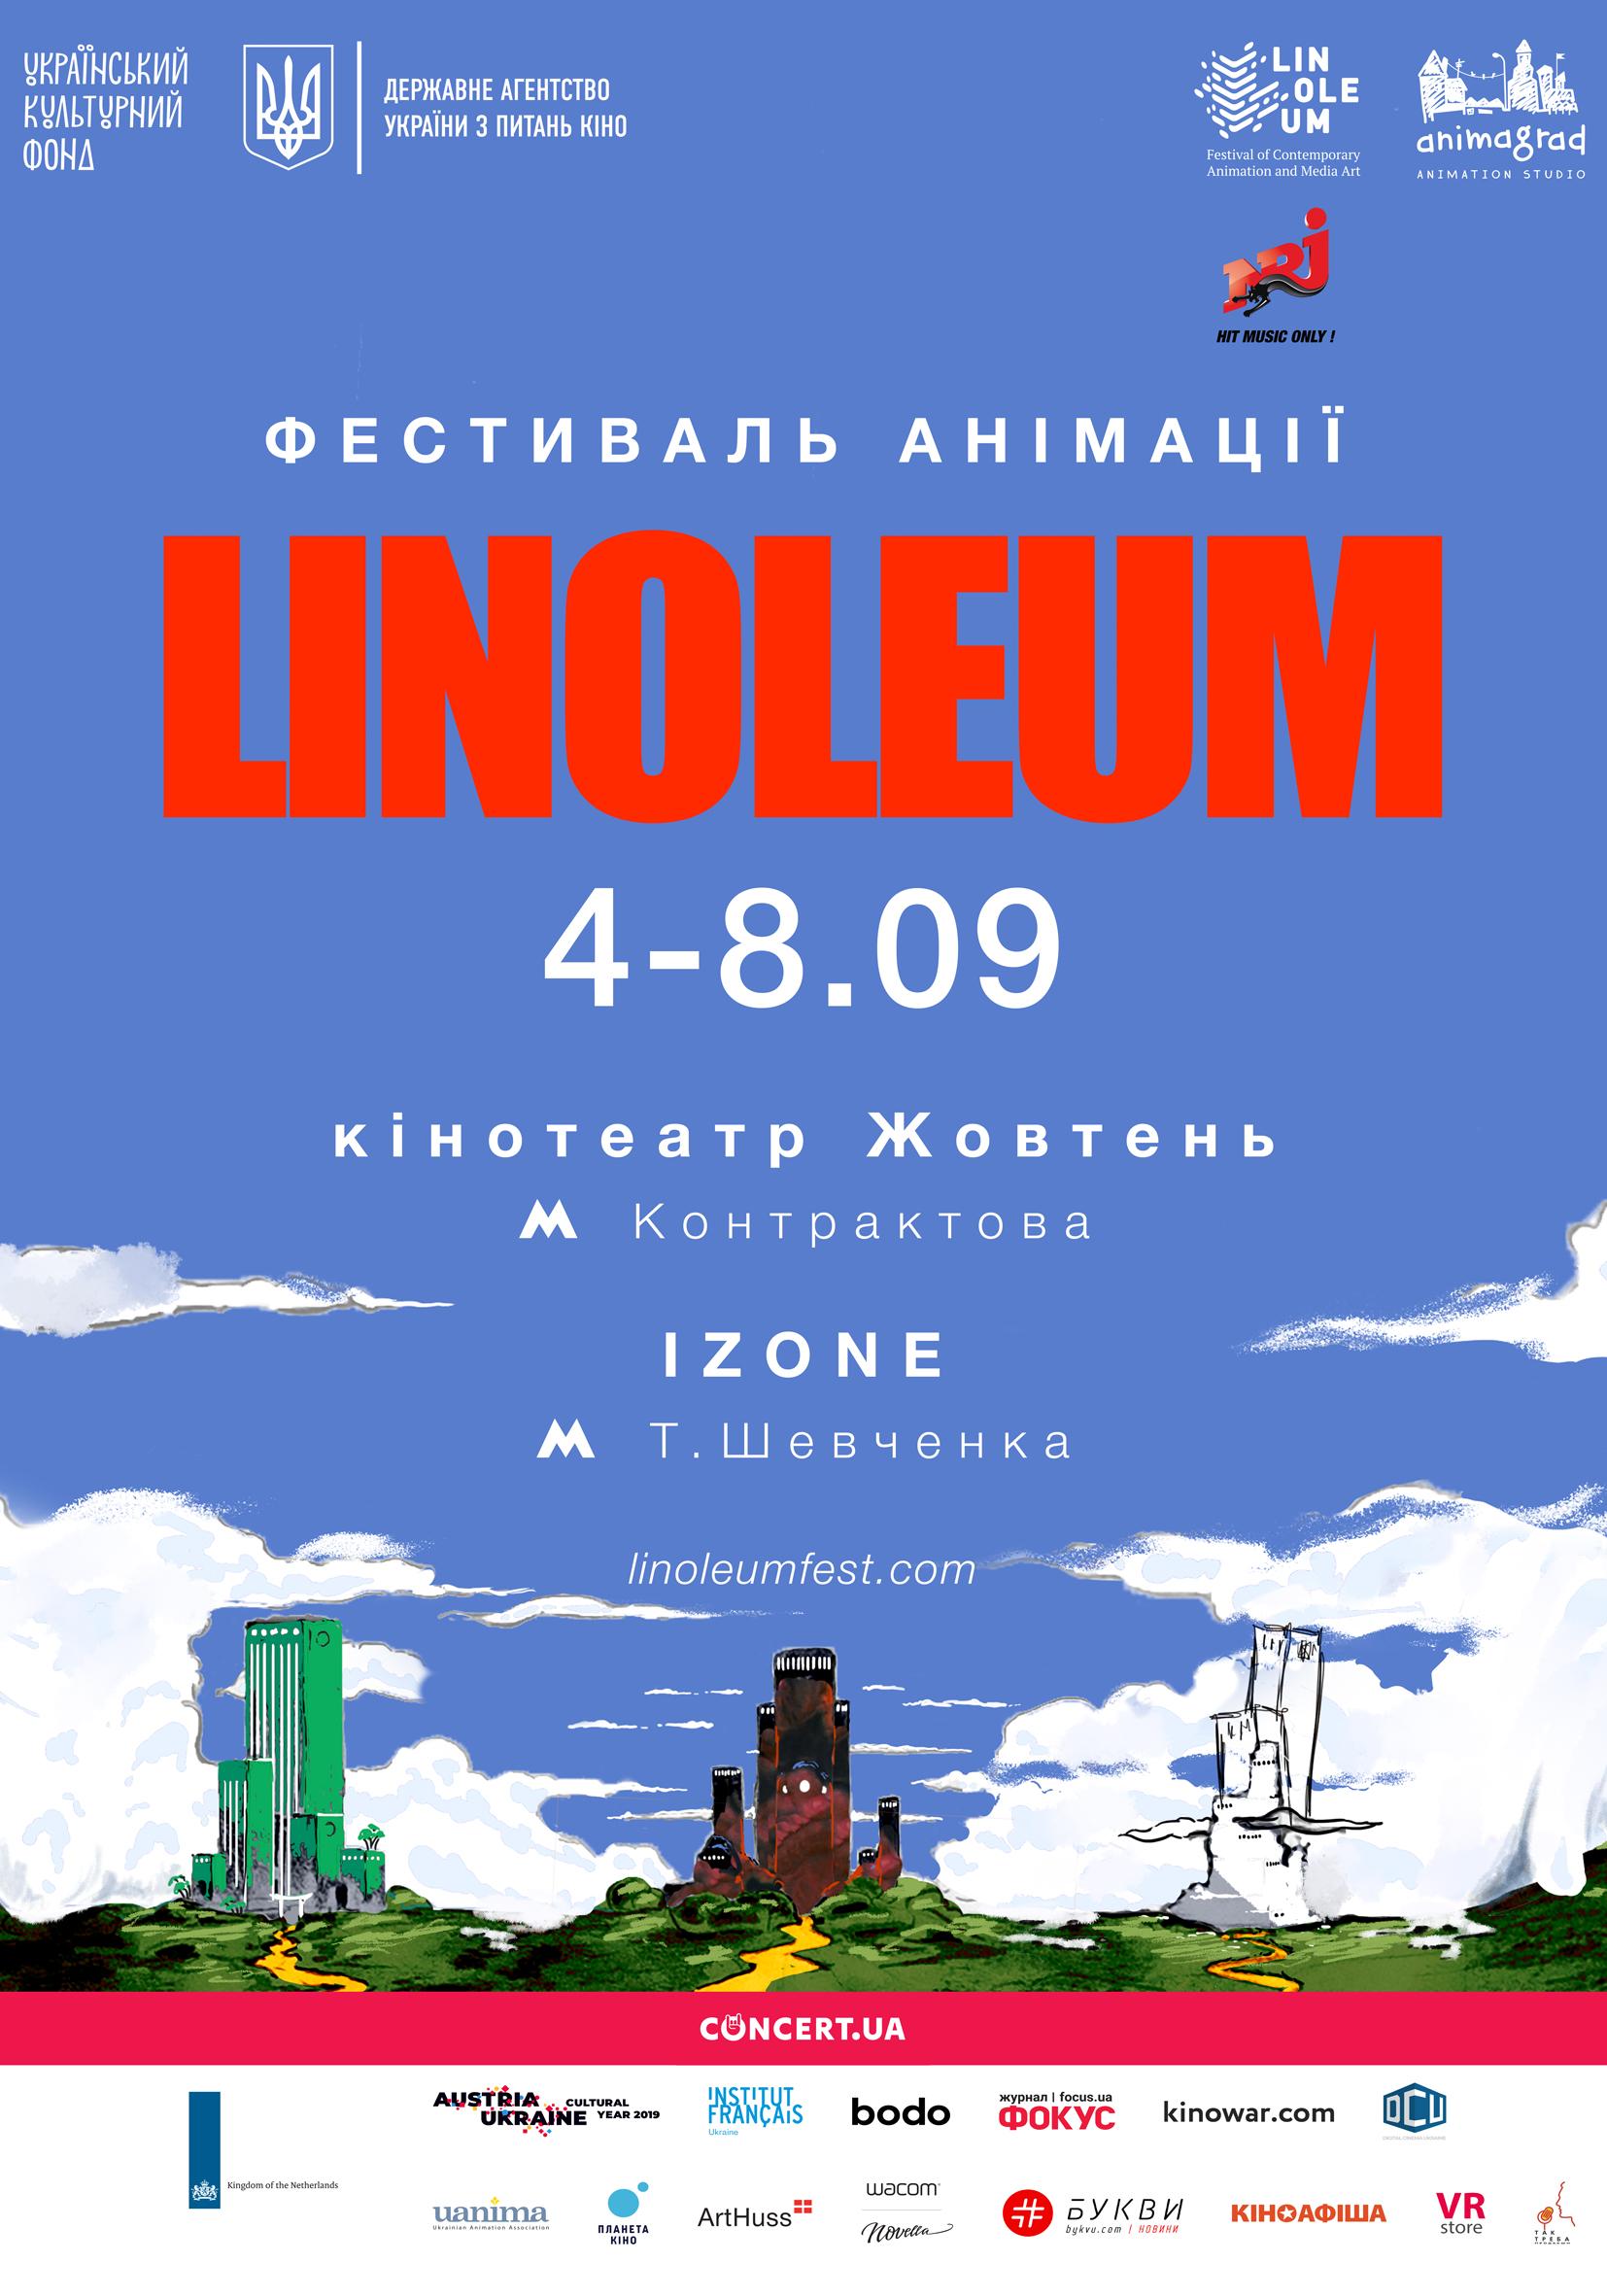 POSTER LINOLEUM 2019